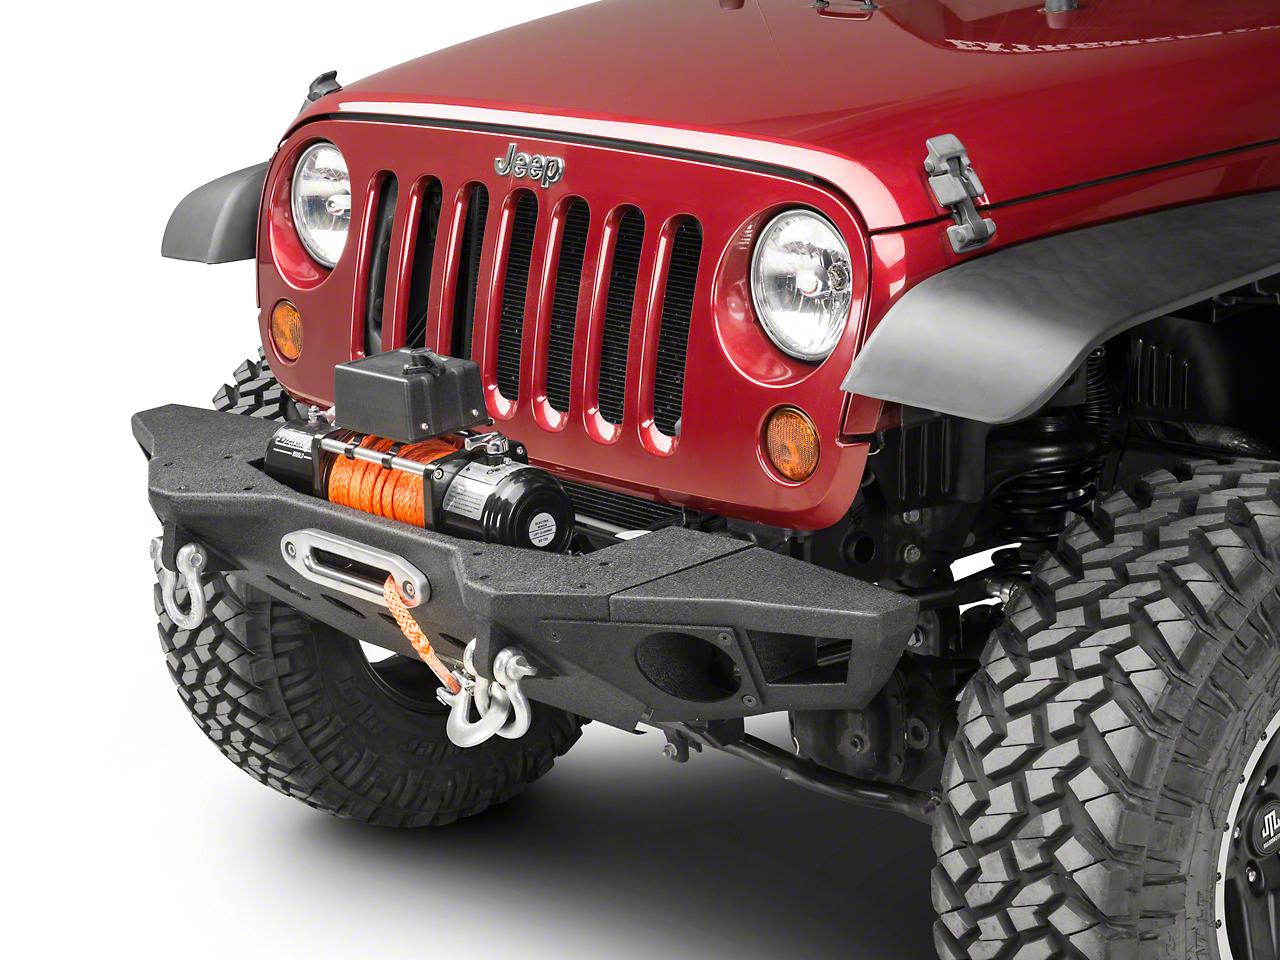 Smittybilt XRC M.O.D. Crawler End Caps - Textured Matte Black (07-18 Jeep Wrangler JK; 2018 Jeep Wrangler JL)